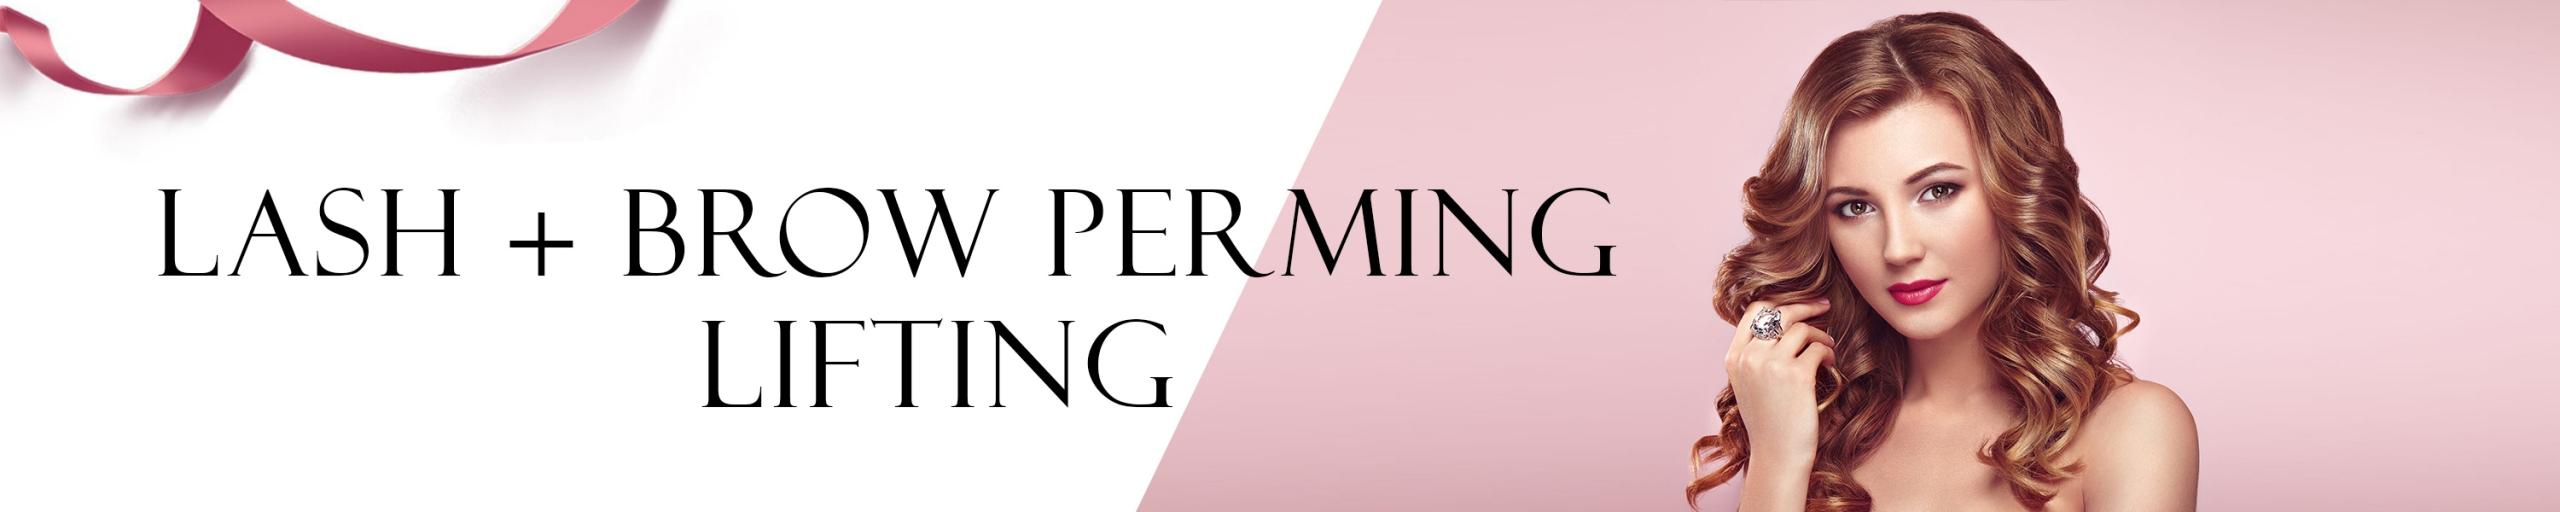 Lash Brow Perming Lifting